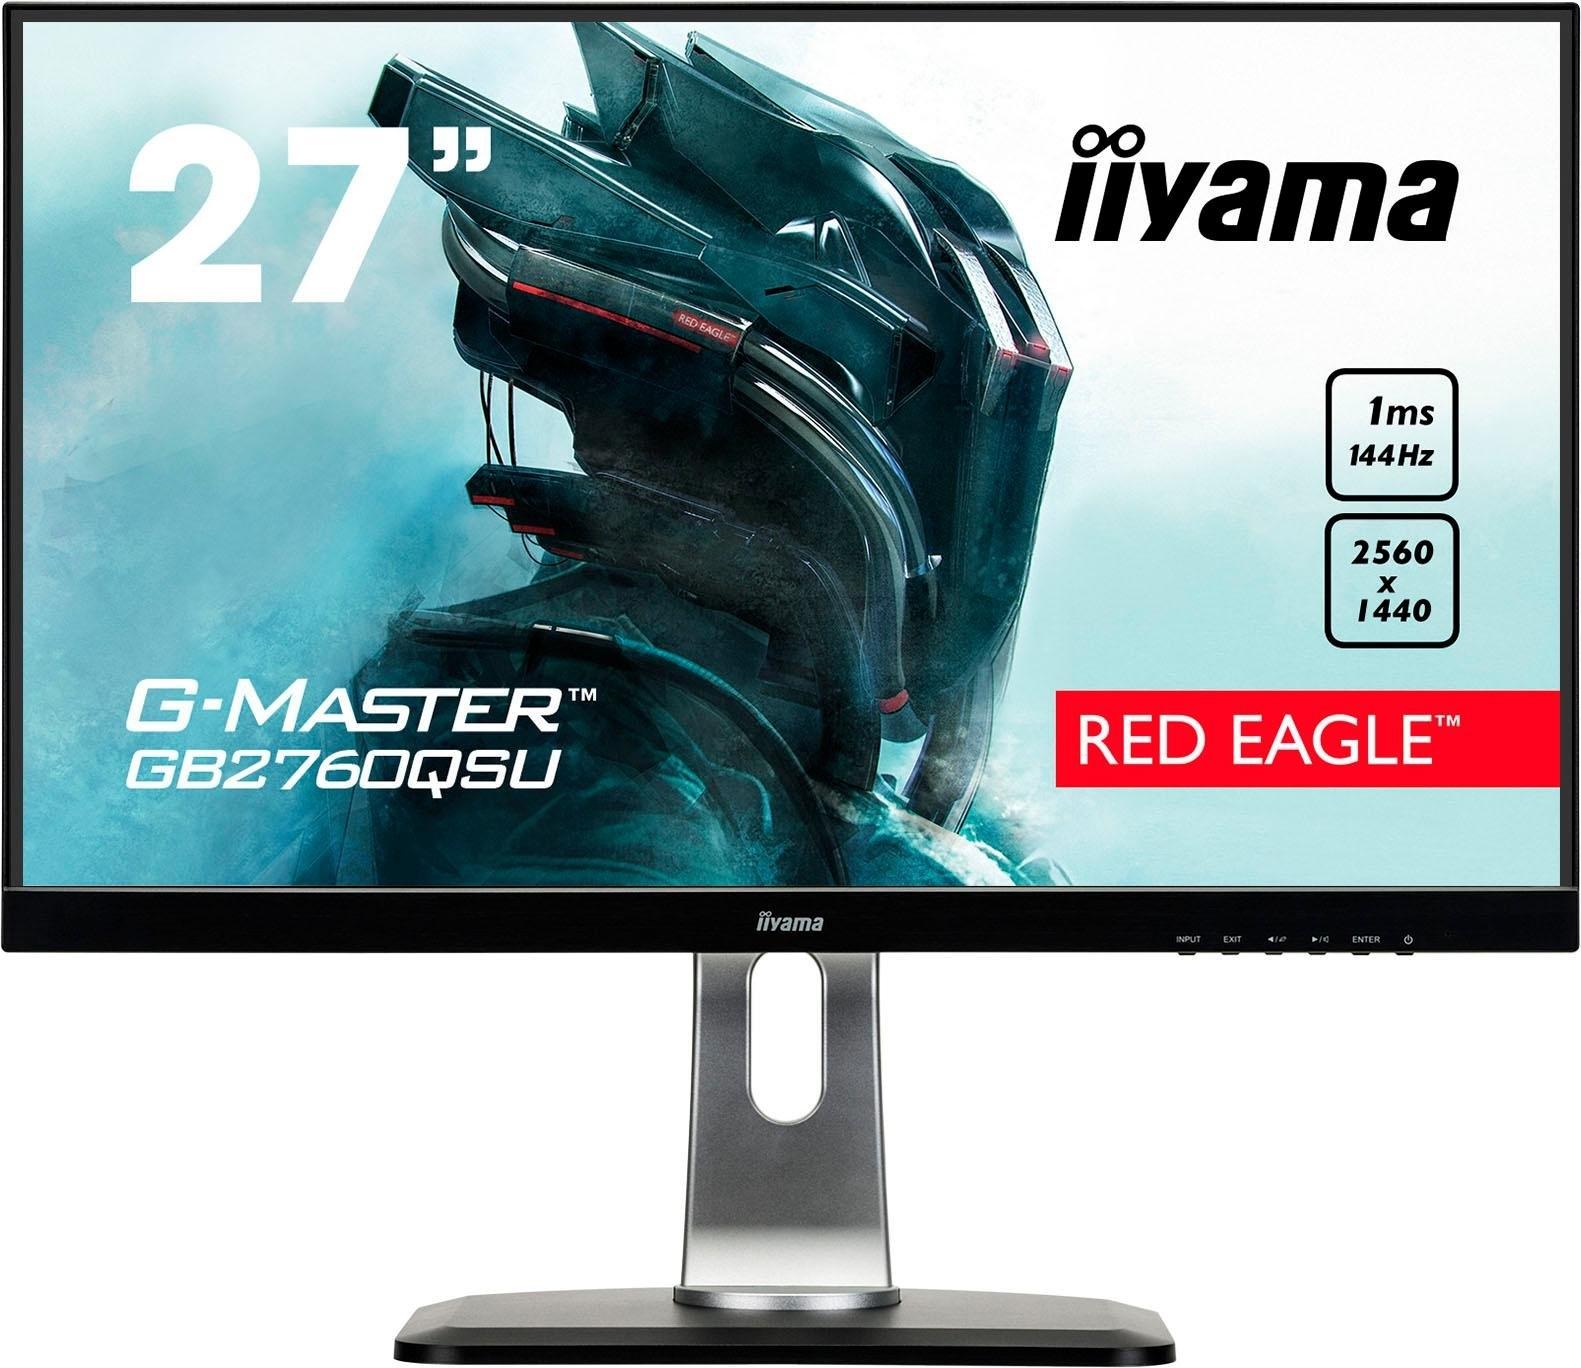 Iiyama »GB2760QSU-B1« gaming-ledscherm (68,5 cm / 27 inch, 2560x1440 pixels, WQHD, 1 ms, 144 Hz) goedkoop op otto.nl kopen